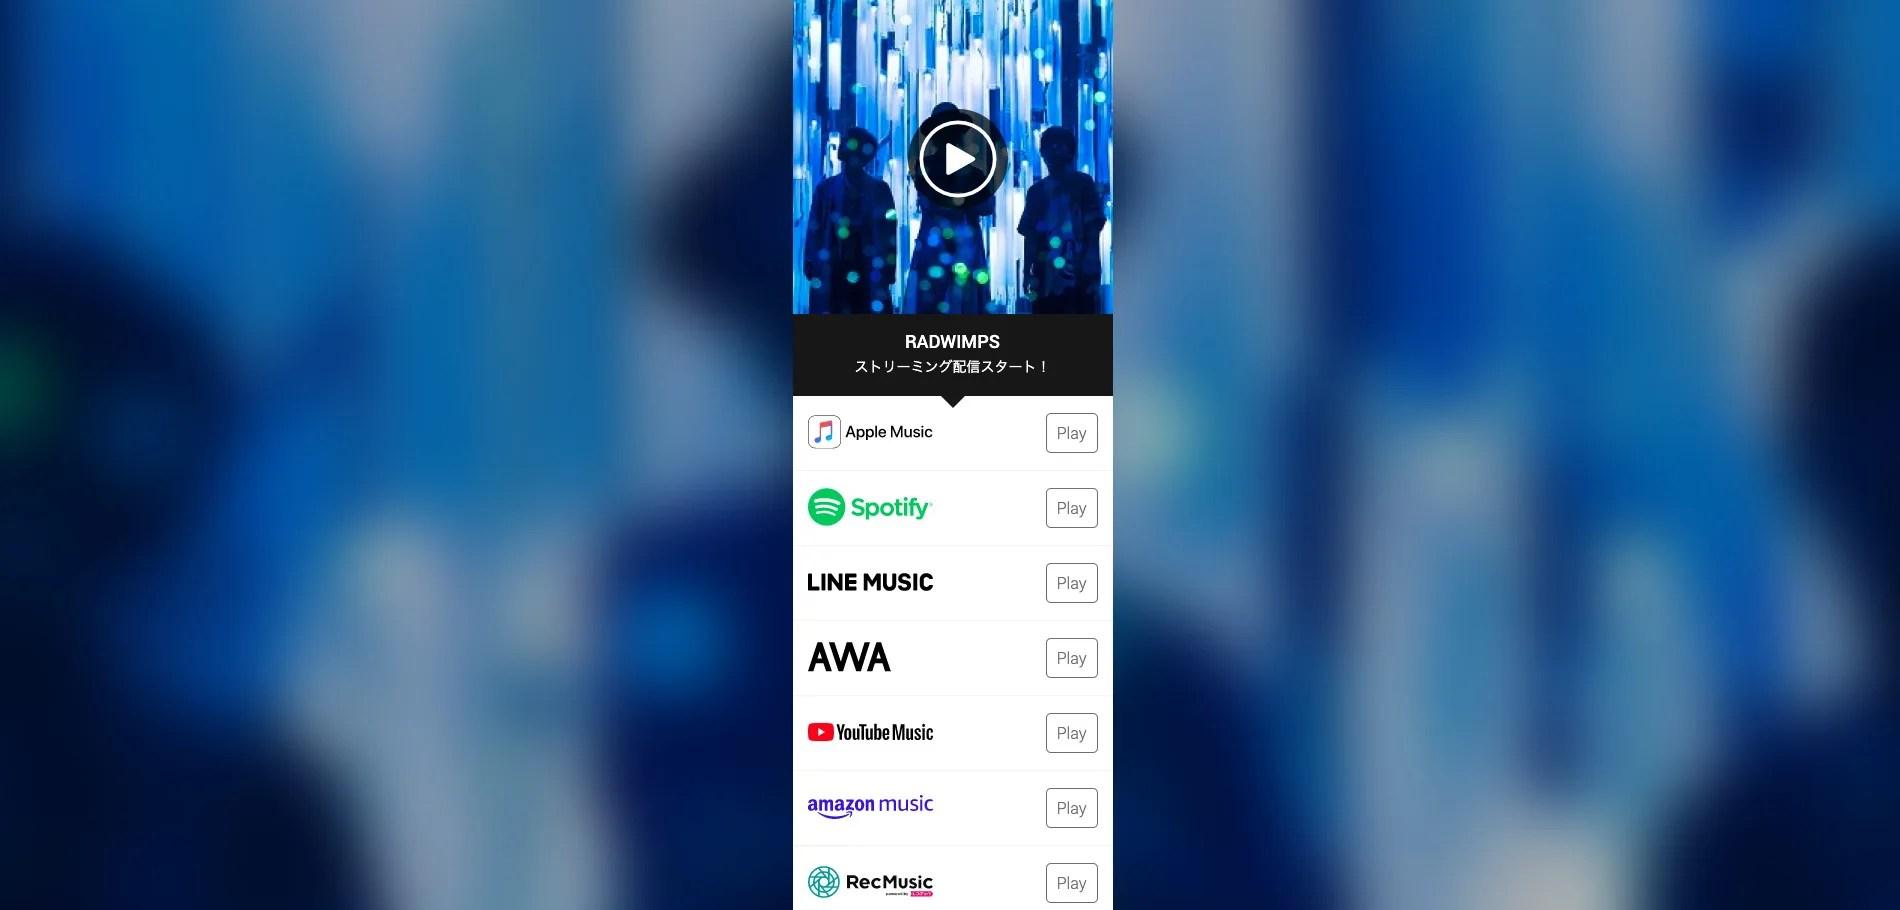 RADWIMPS、全ての楽曲をサブスクリプションサービスで配信スタート。国内主要サービスに対応。